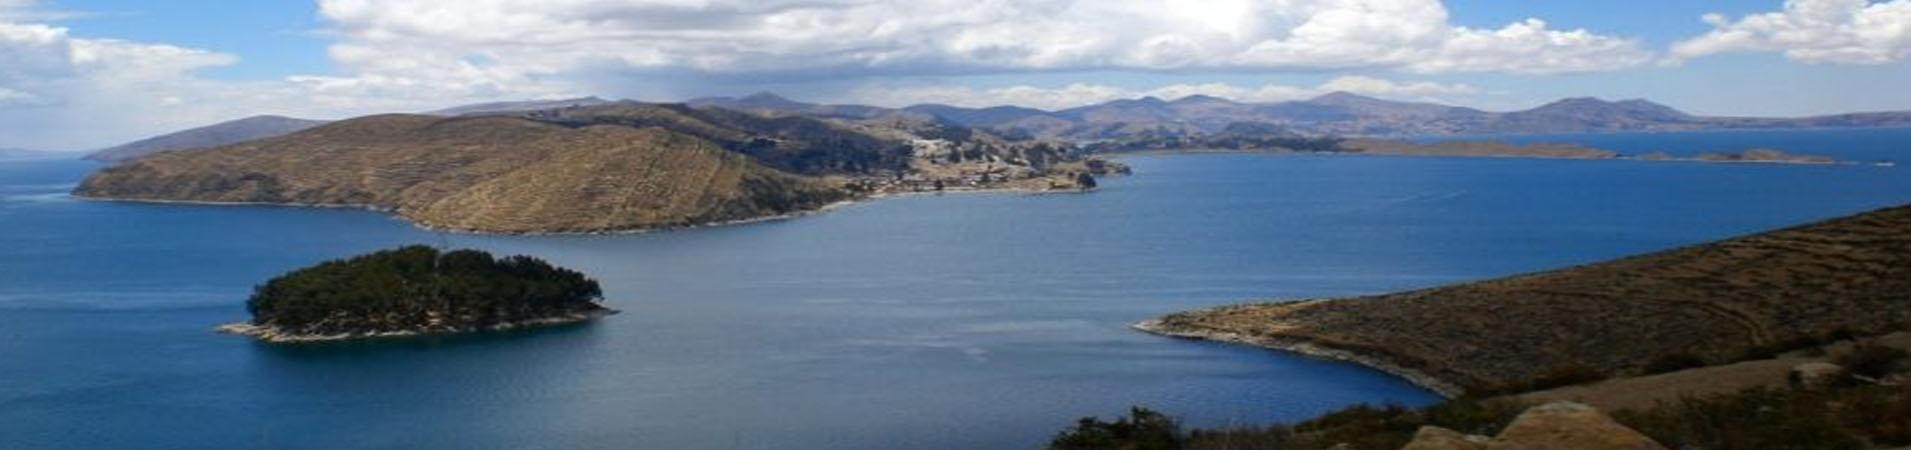 lago titicaca puno uros taquile amantani peru travel agency qori